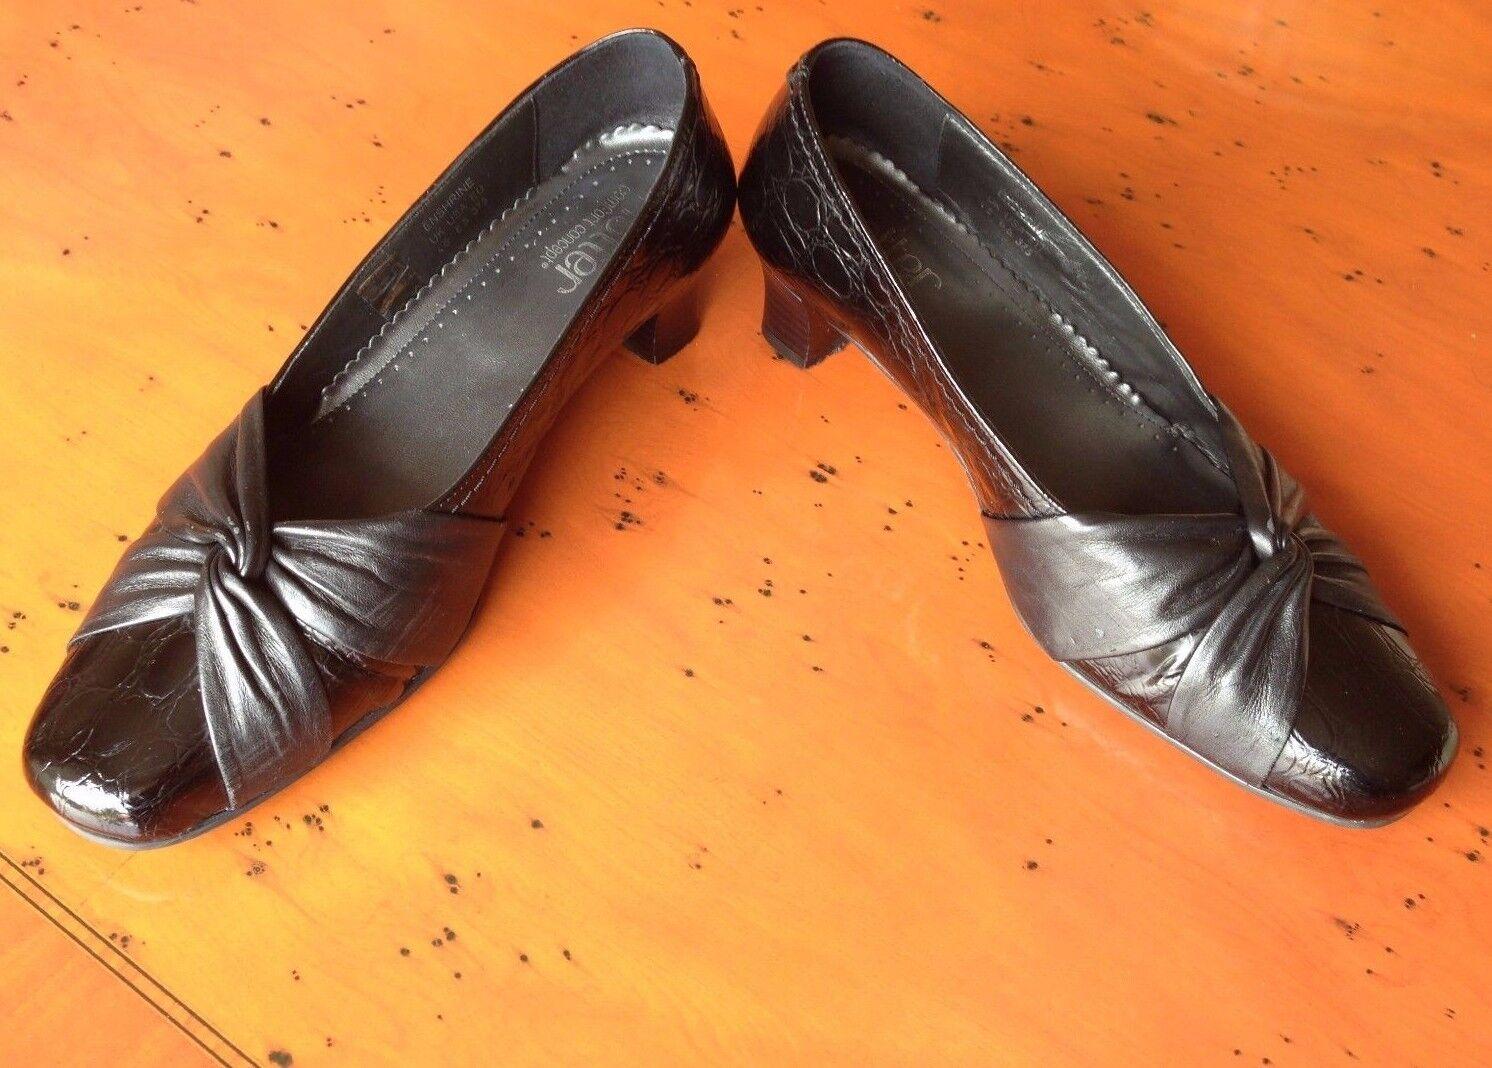 Hotter Enshrine black patent croc print leather court shoes UK 4.5 EU 37.5